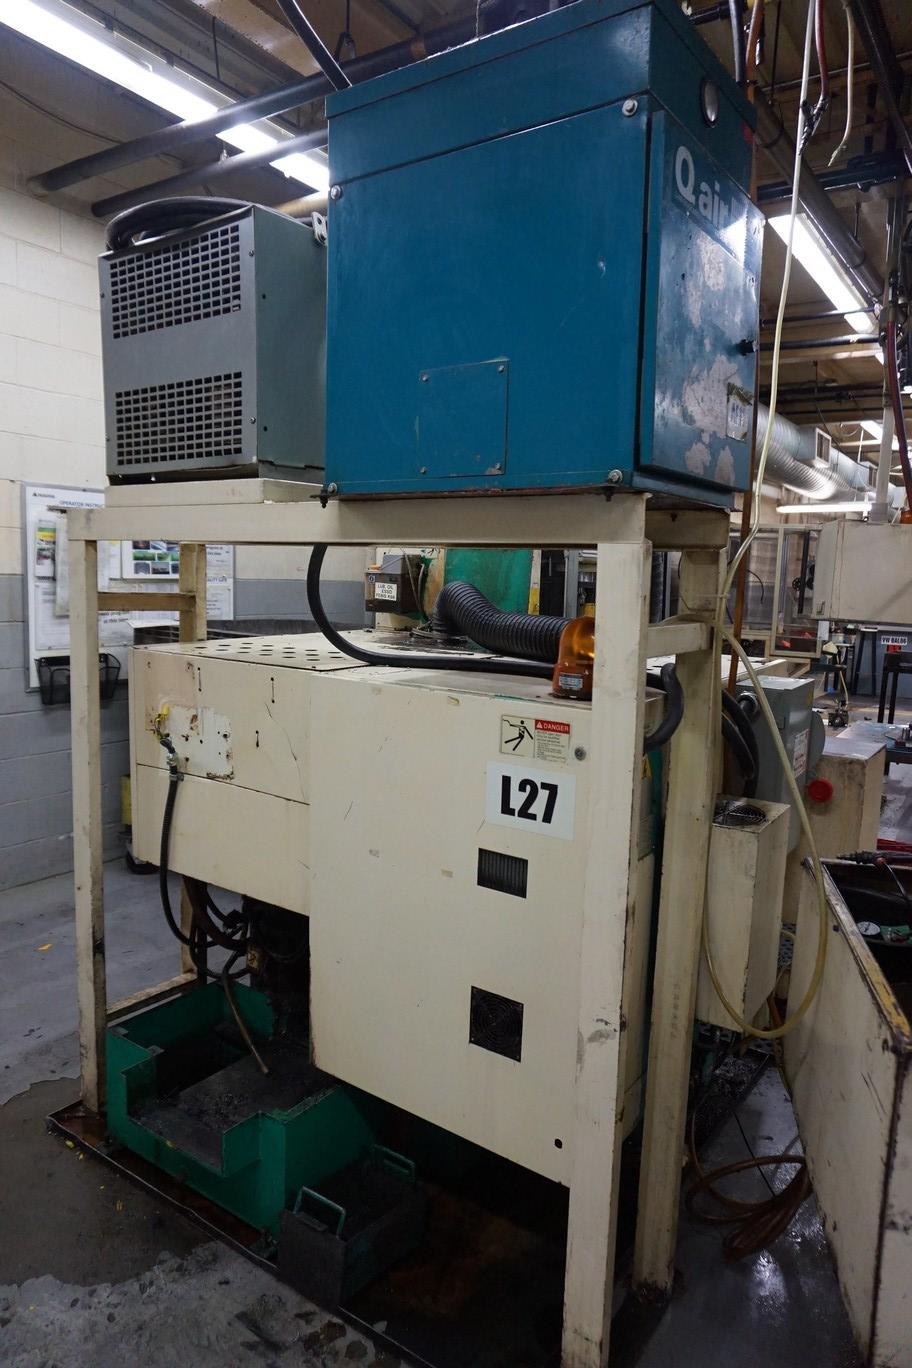 Takamatsu Model X10 CNC Lathe 200/220V c/w Chip Conveyor, Transformer - Image 5 of 5